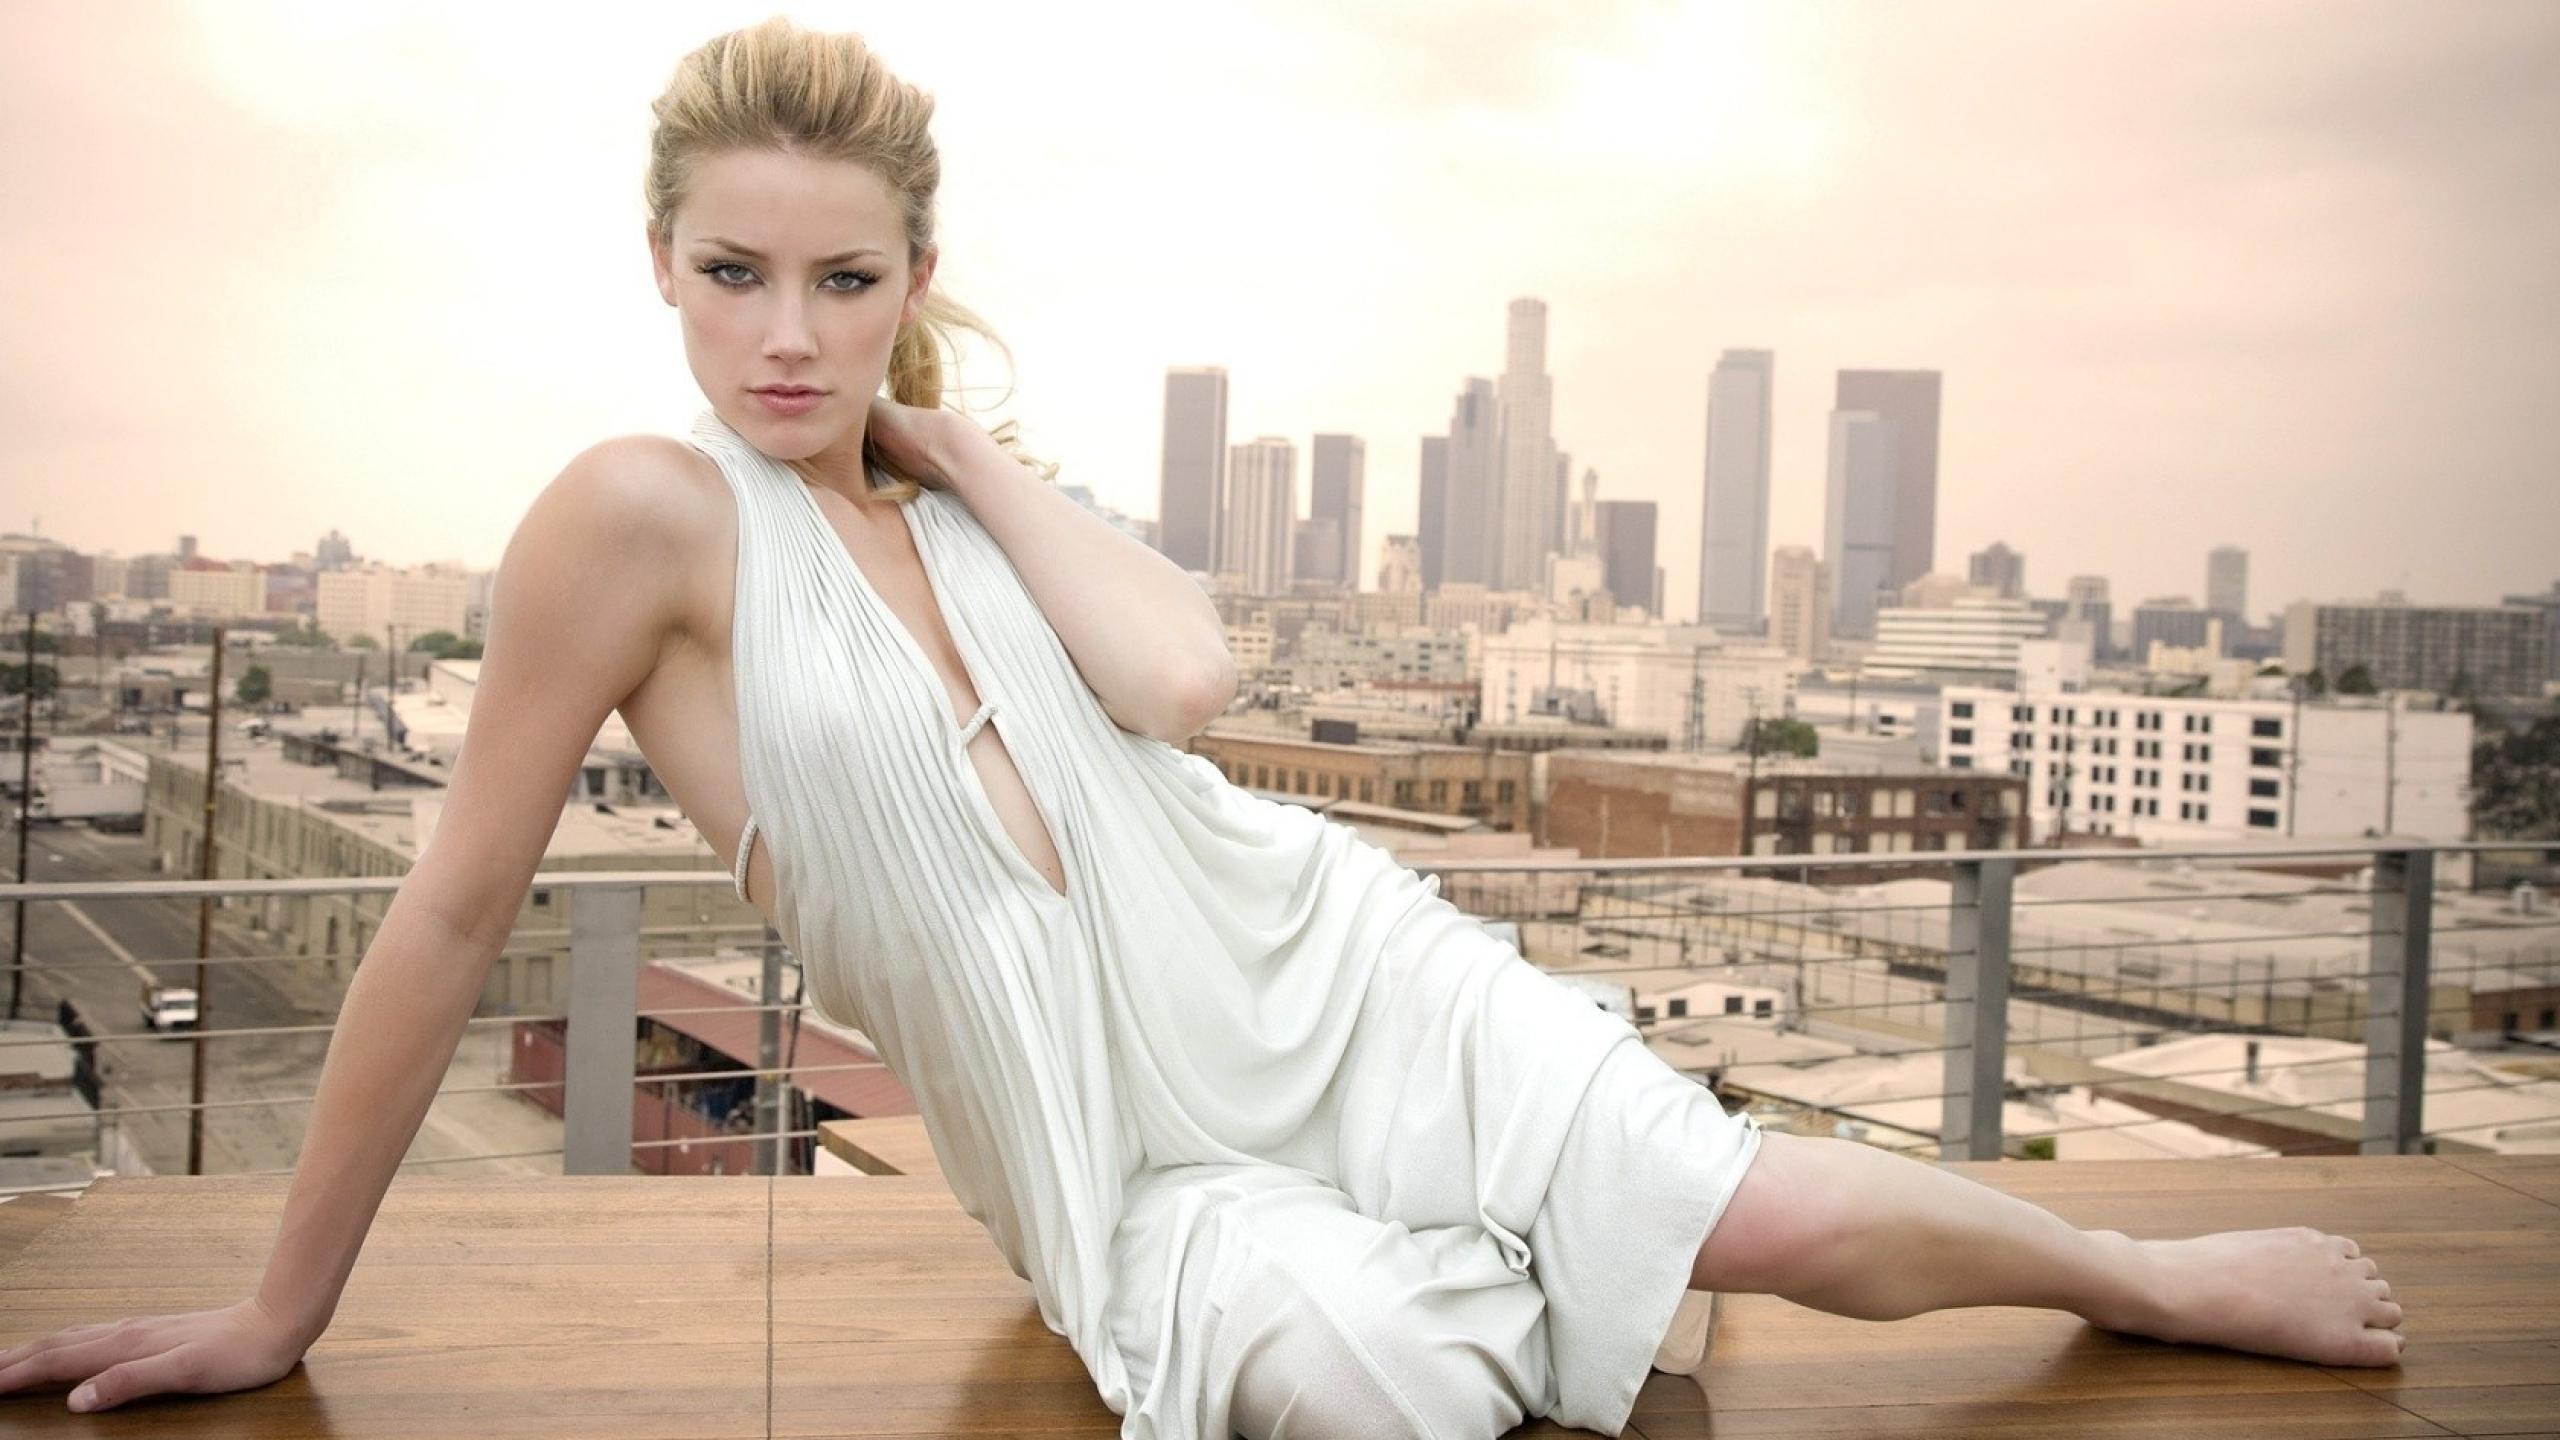 woman_fashion_outdoors_amber_heard_city_2560x1440_hd-wallpaper-1116383